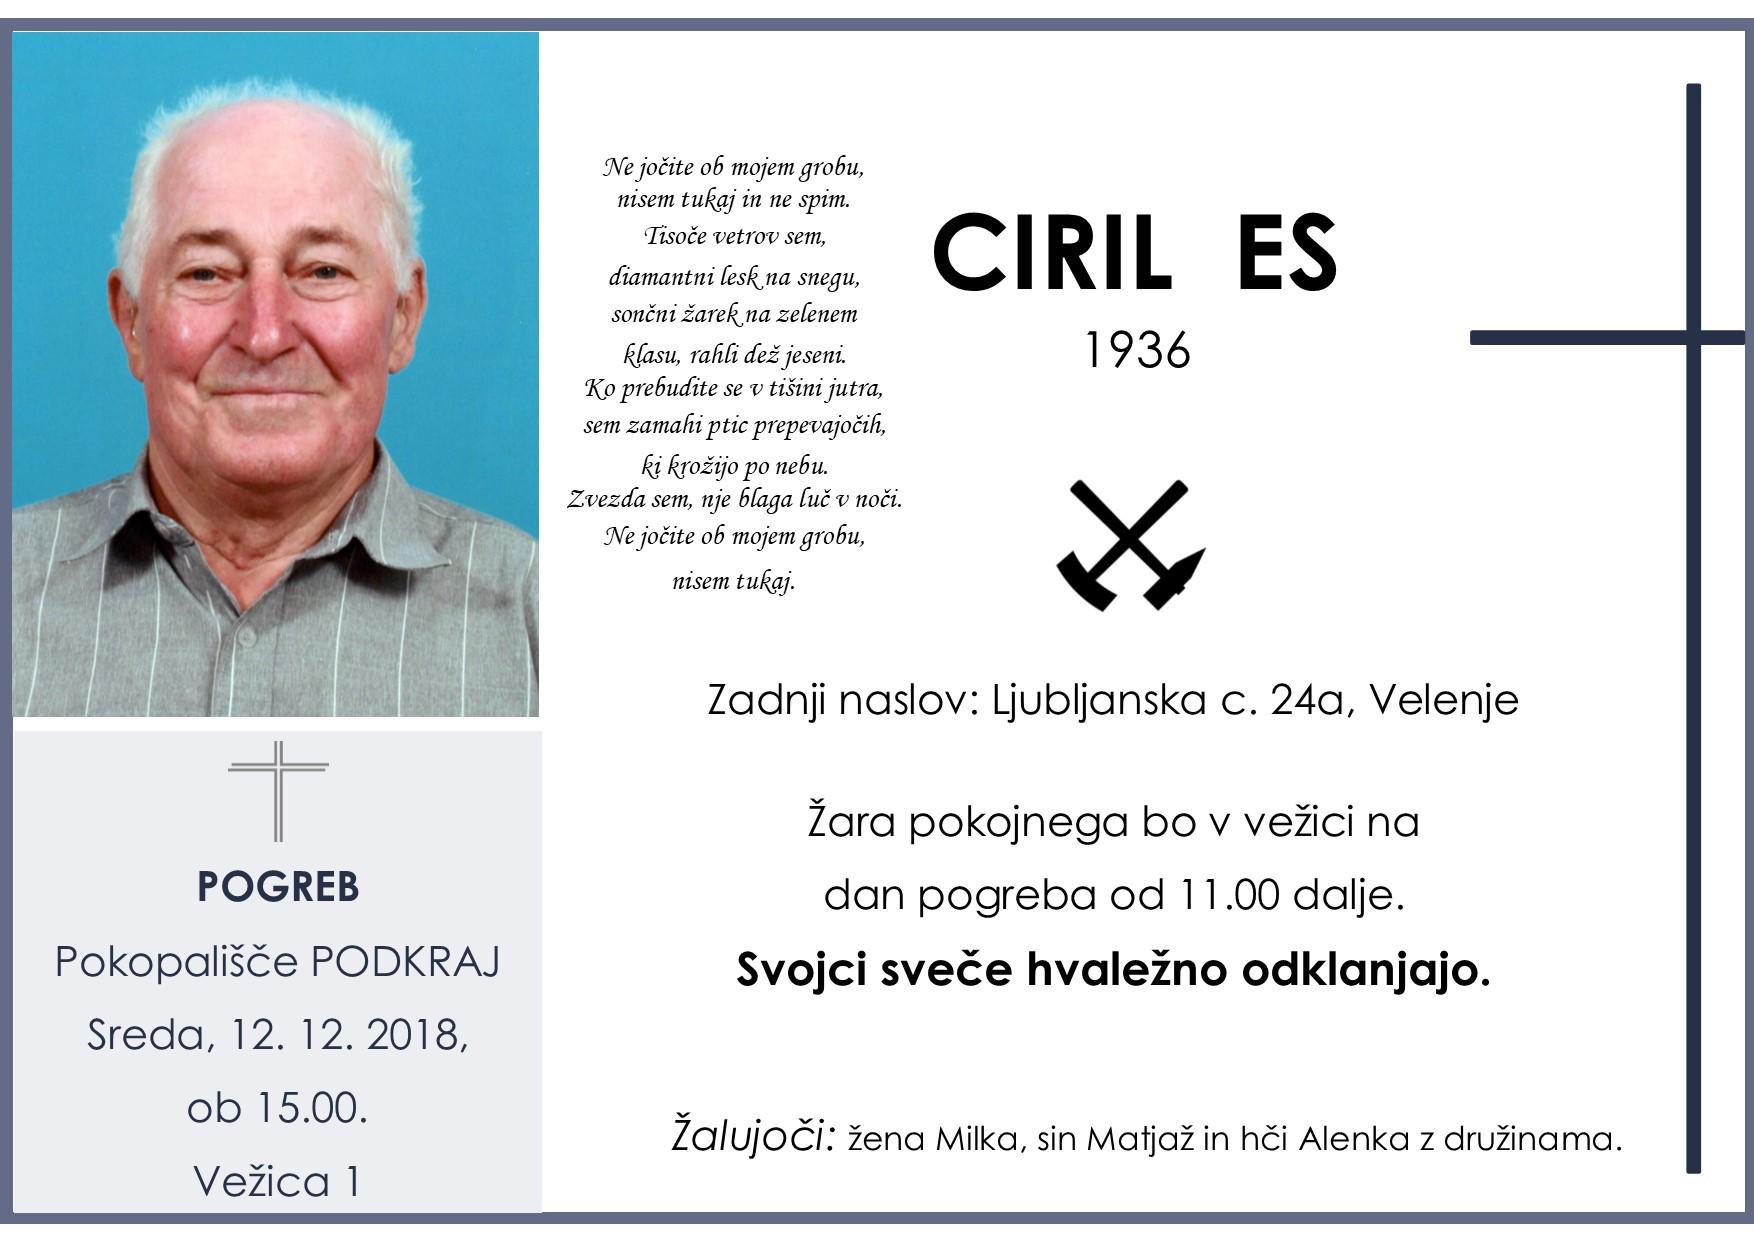 CIRIL ES, Podkraj, 12. 12. 2018